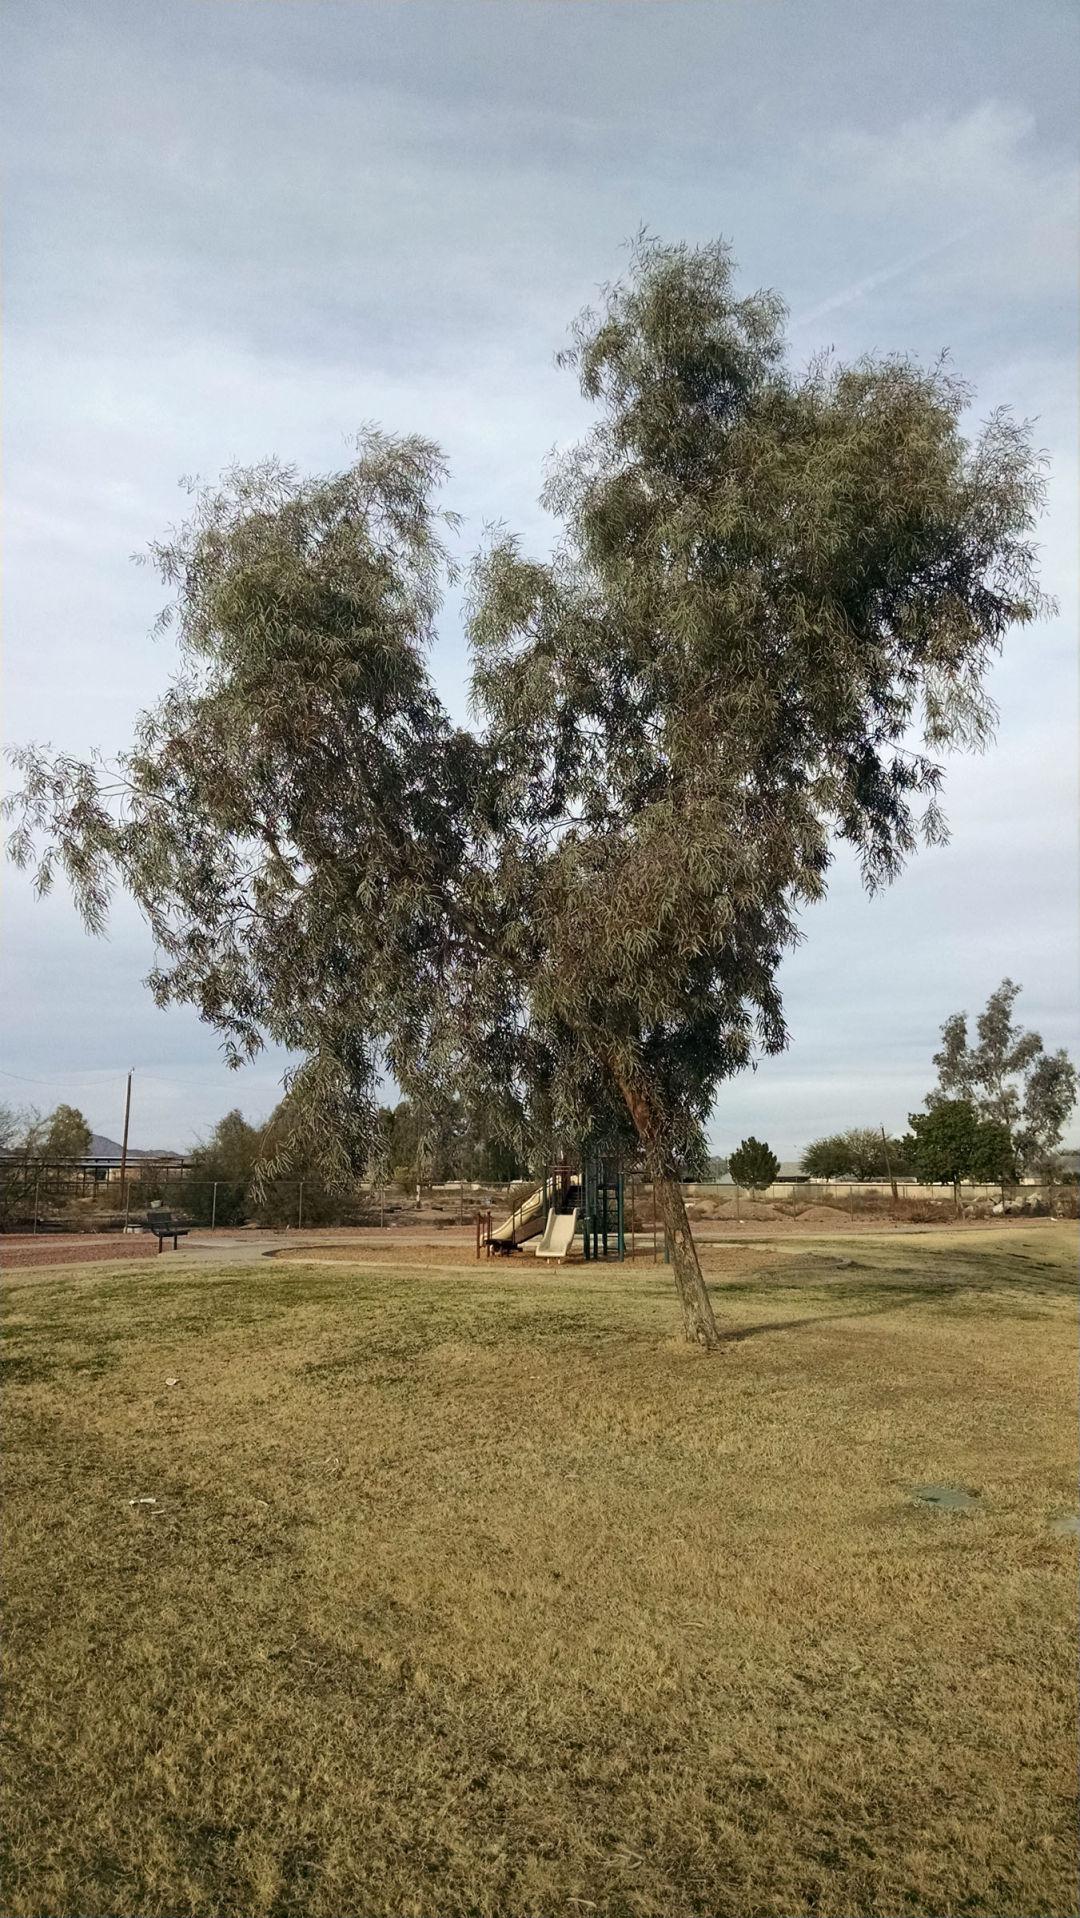 Arizona Gardeners: Eucalyptus trees in desert areas | Home And ...